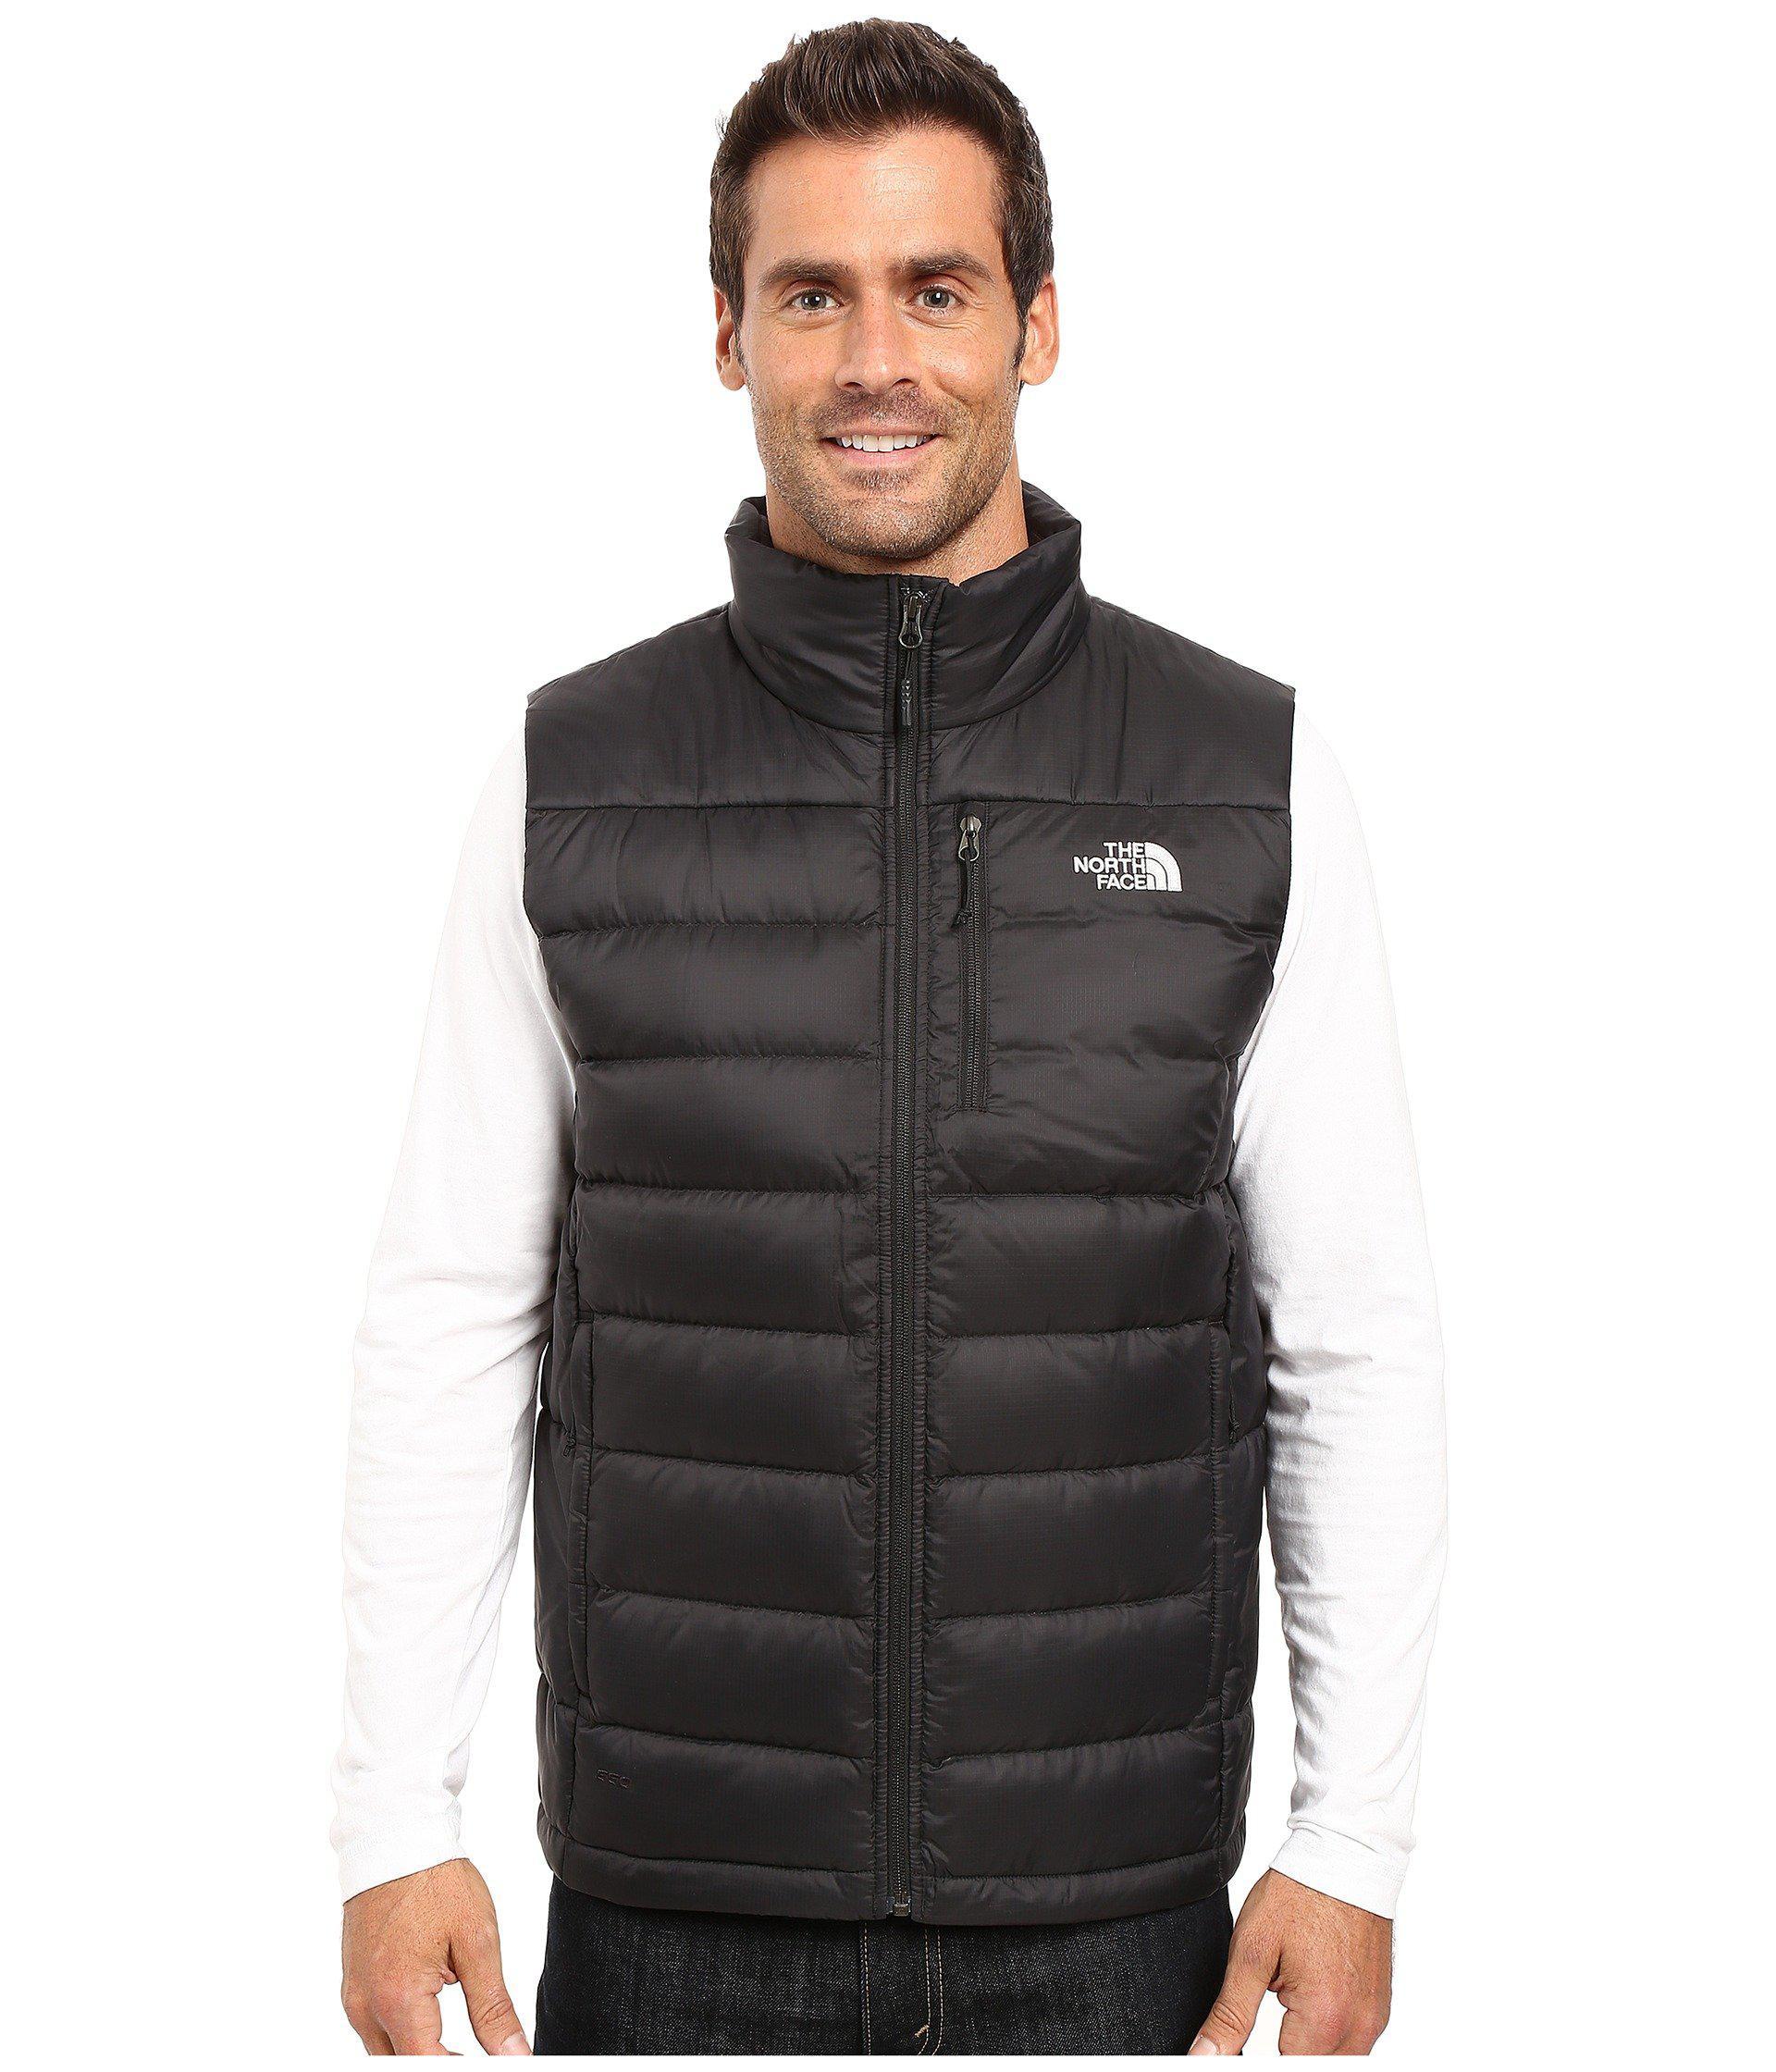 Lyst - The North Face Aconcagua Vest (tnf Black) Men s Vest for Men ... 7fce0add7